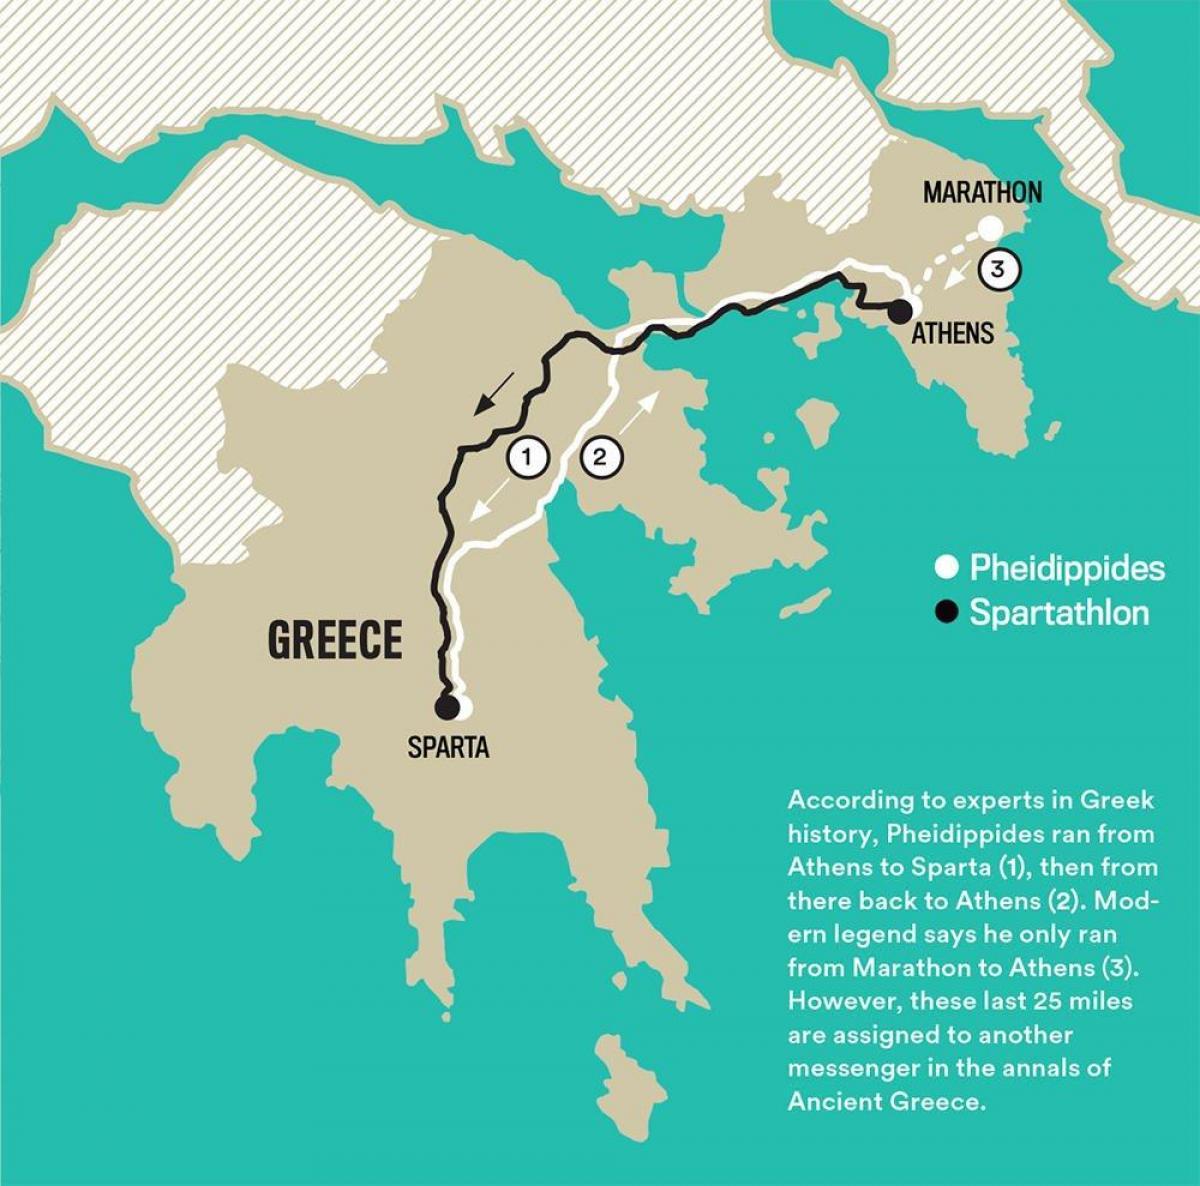 marathon grekland karta Marathon antika Grekland karta   Karta över antikens Grekland  marathon grekland karta